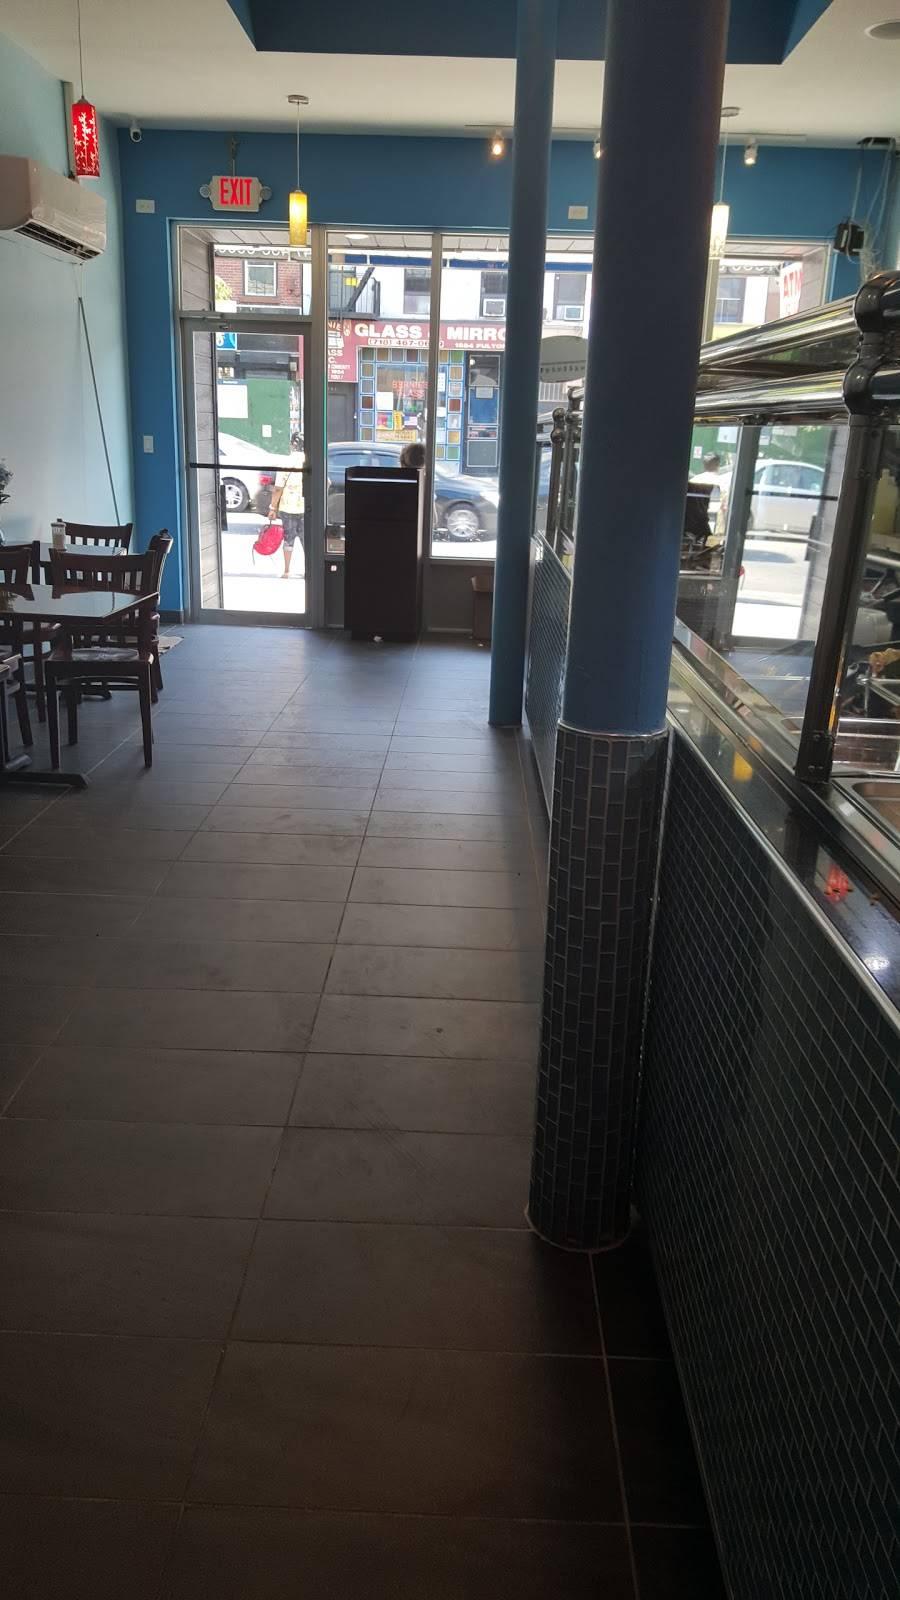 Blue Cafe   restaurant   1563 Fulton St, Brooklyn, NY 11216, USA   3474066050 OR +1 347-406-6050